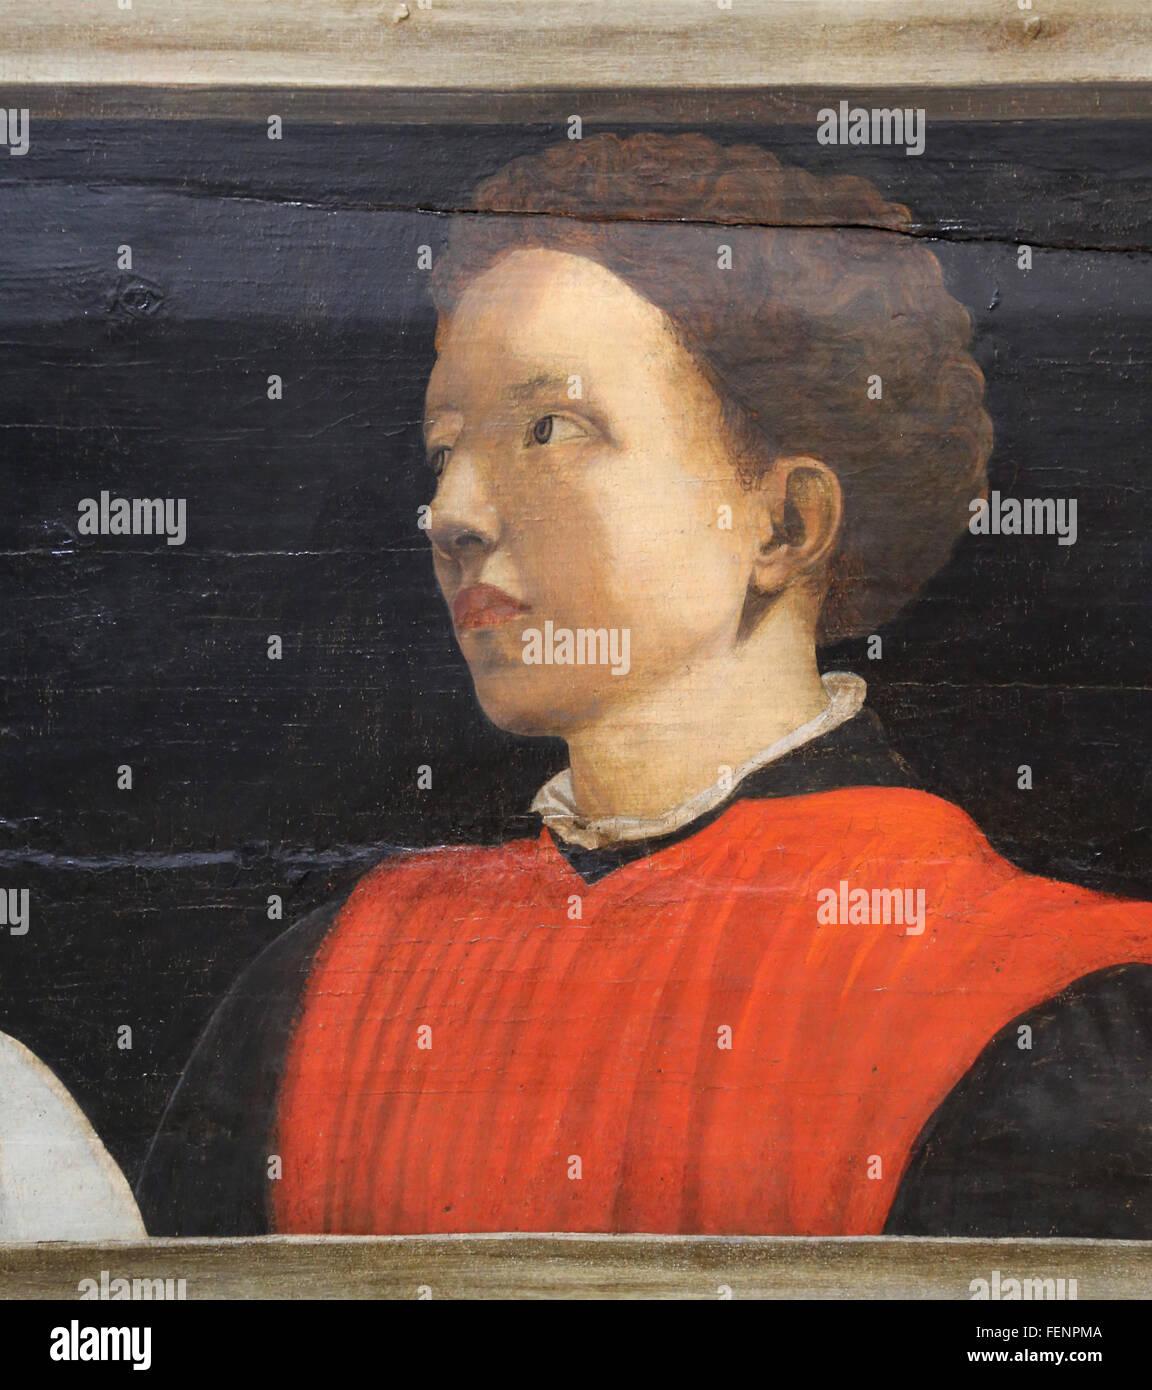 Portrait of Italian mathematician and architect Antonio Mantti (1423-1497). Five famous men, 1450, by Paolo Ucello - Stock Image